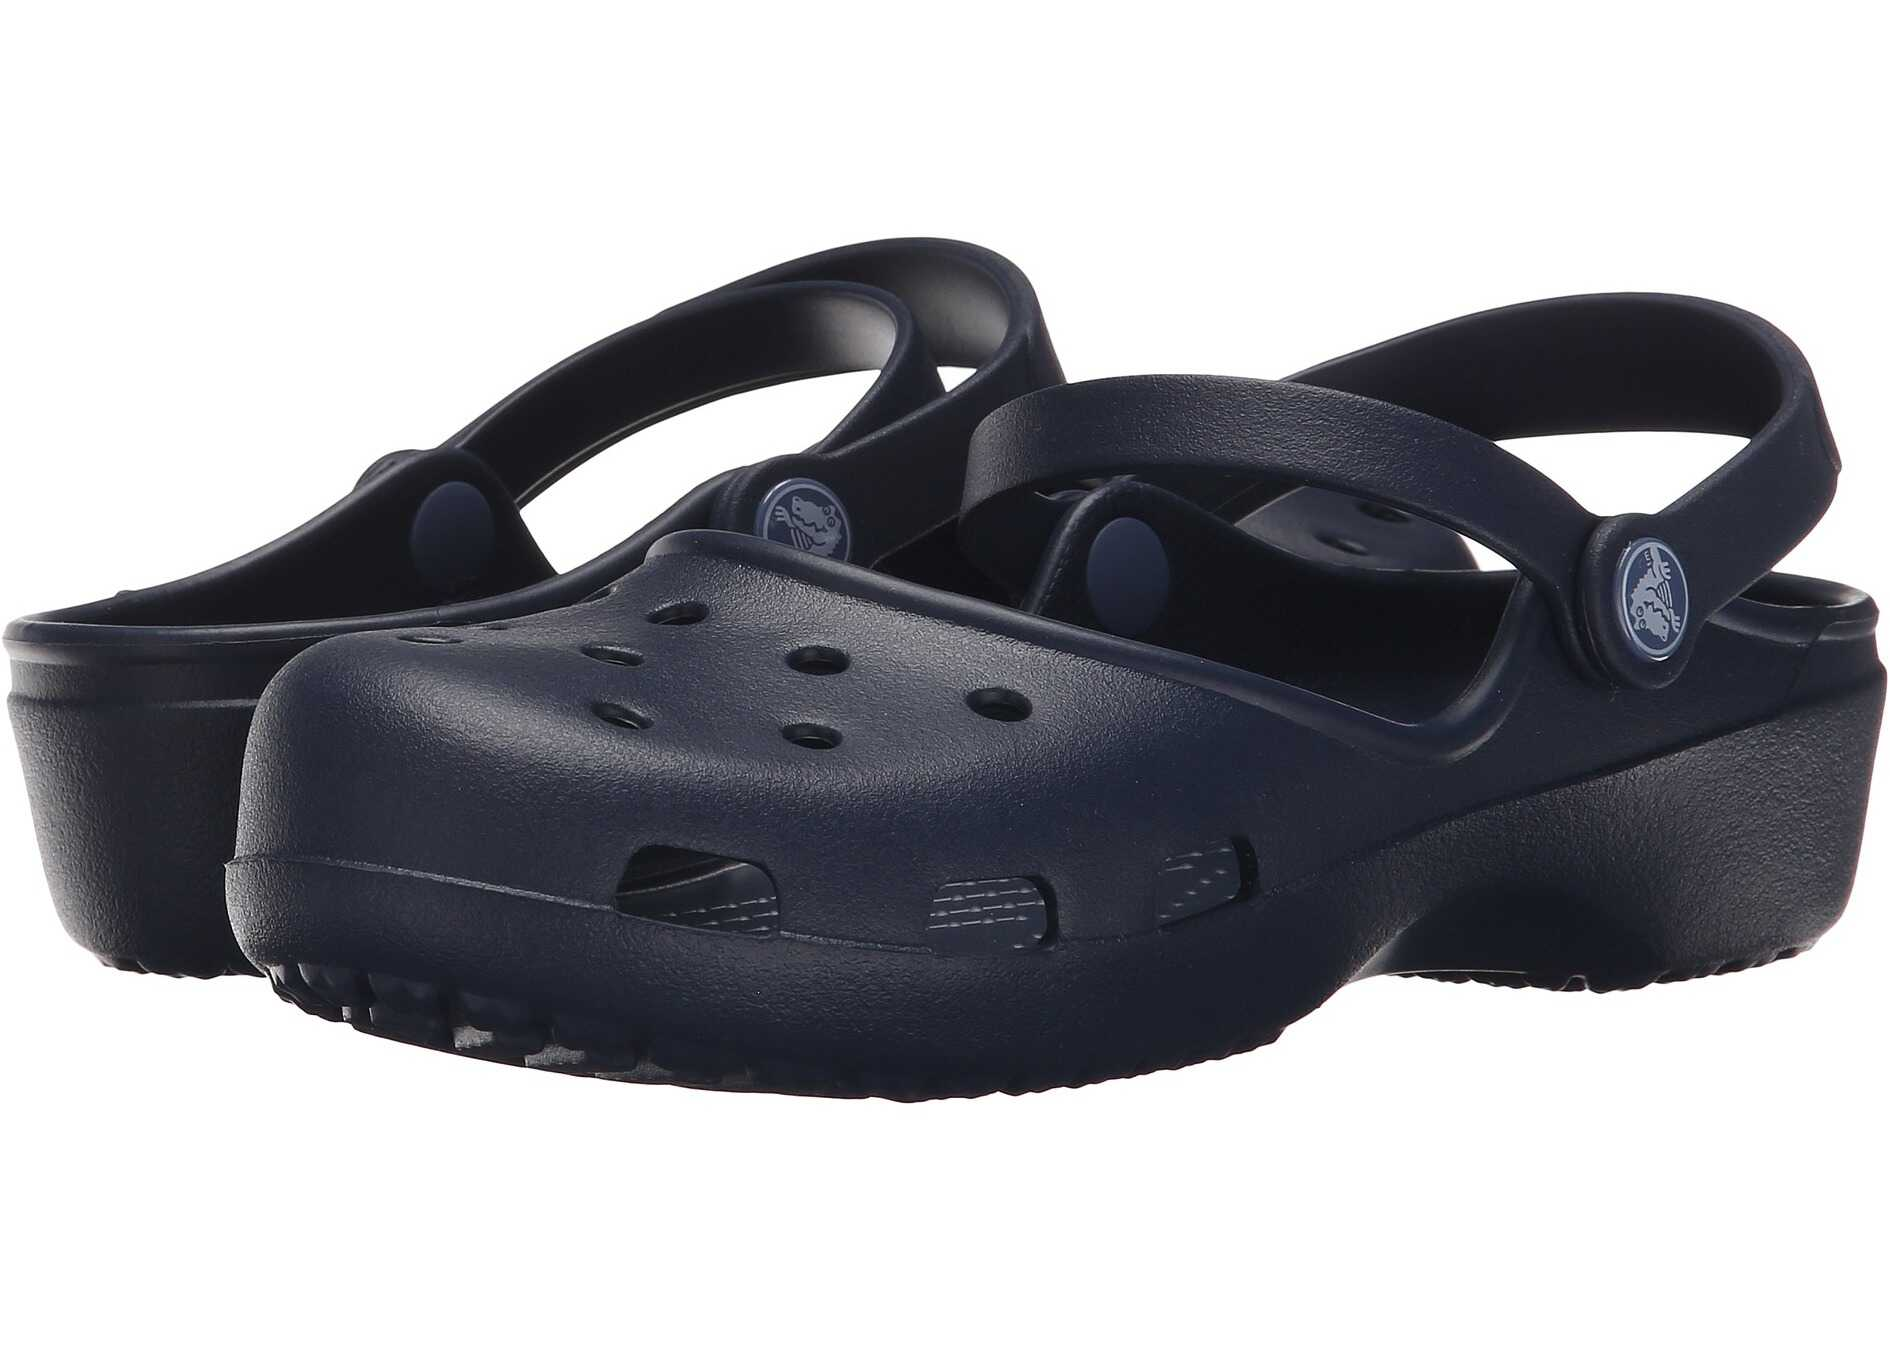 Crocs Karin Clog Navy